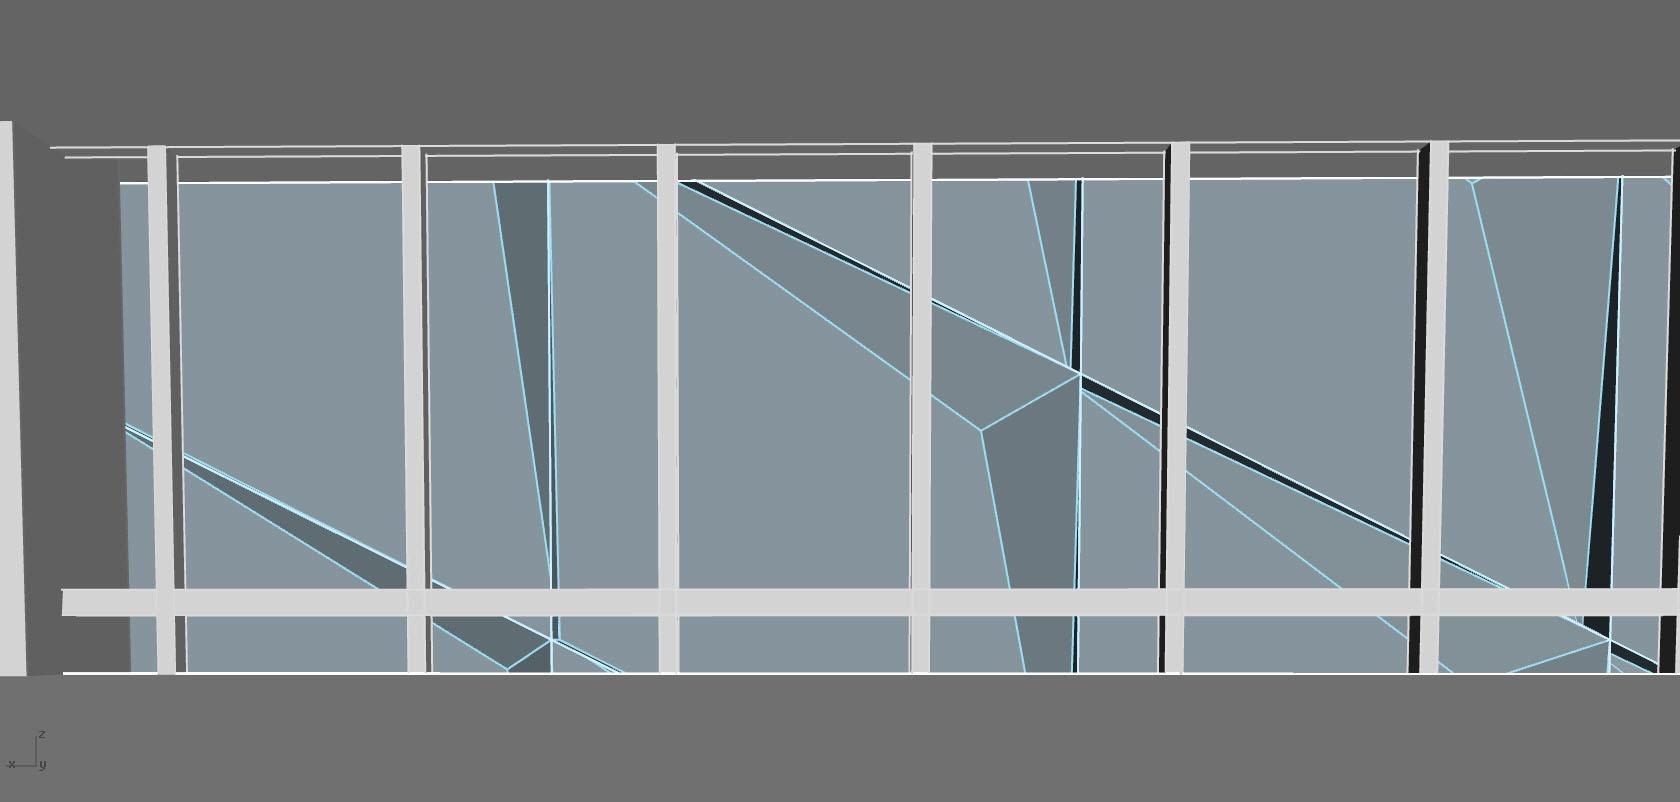 HCT_DSN_panel_23